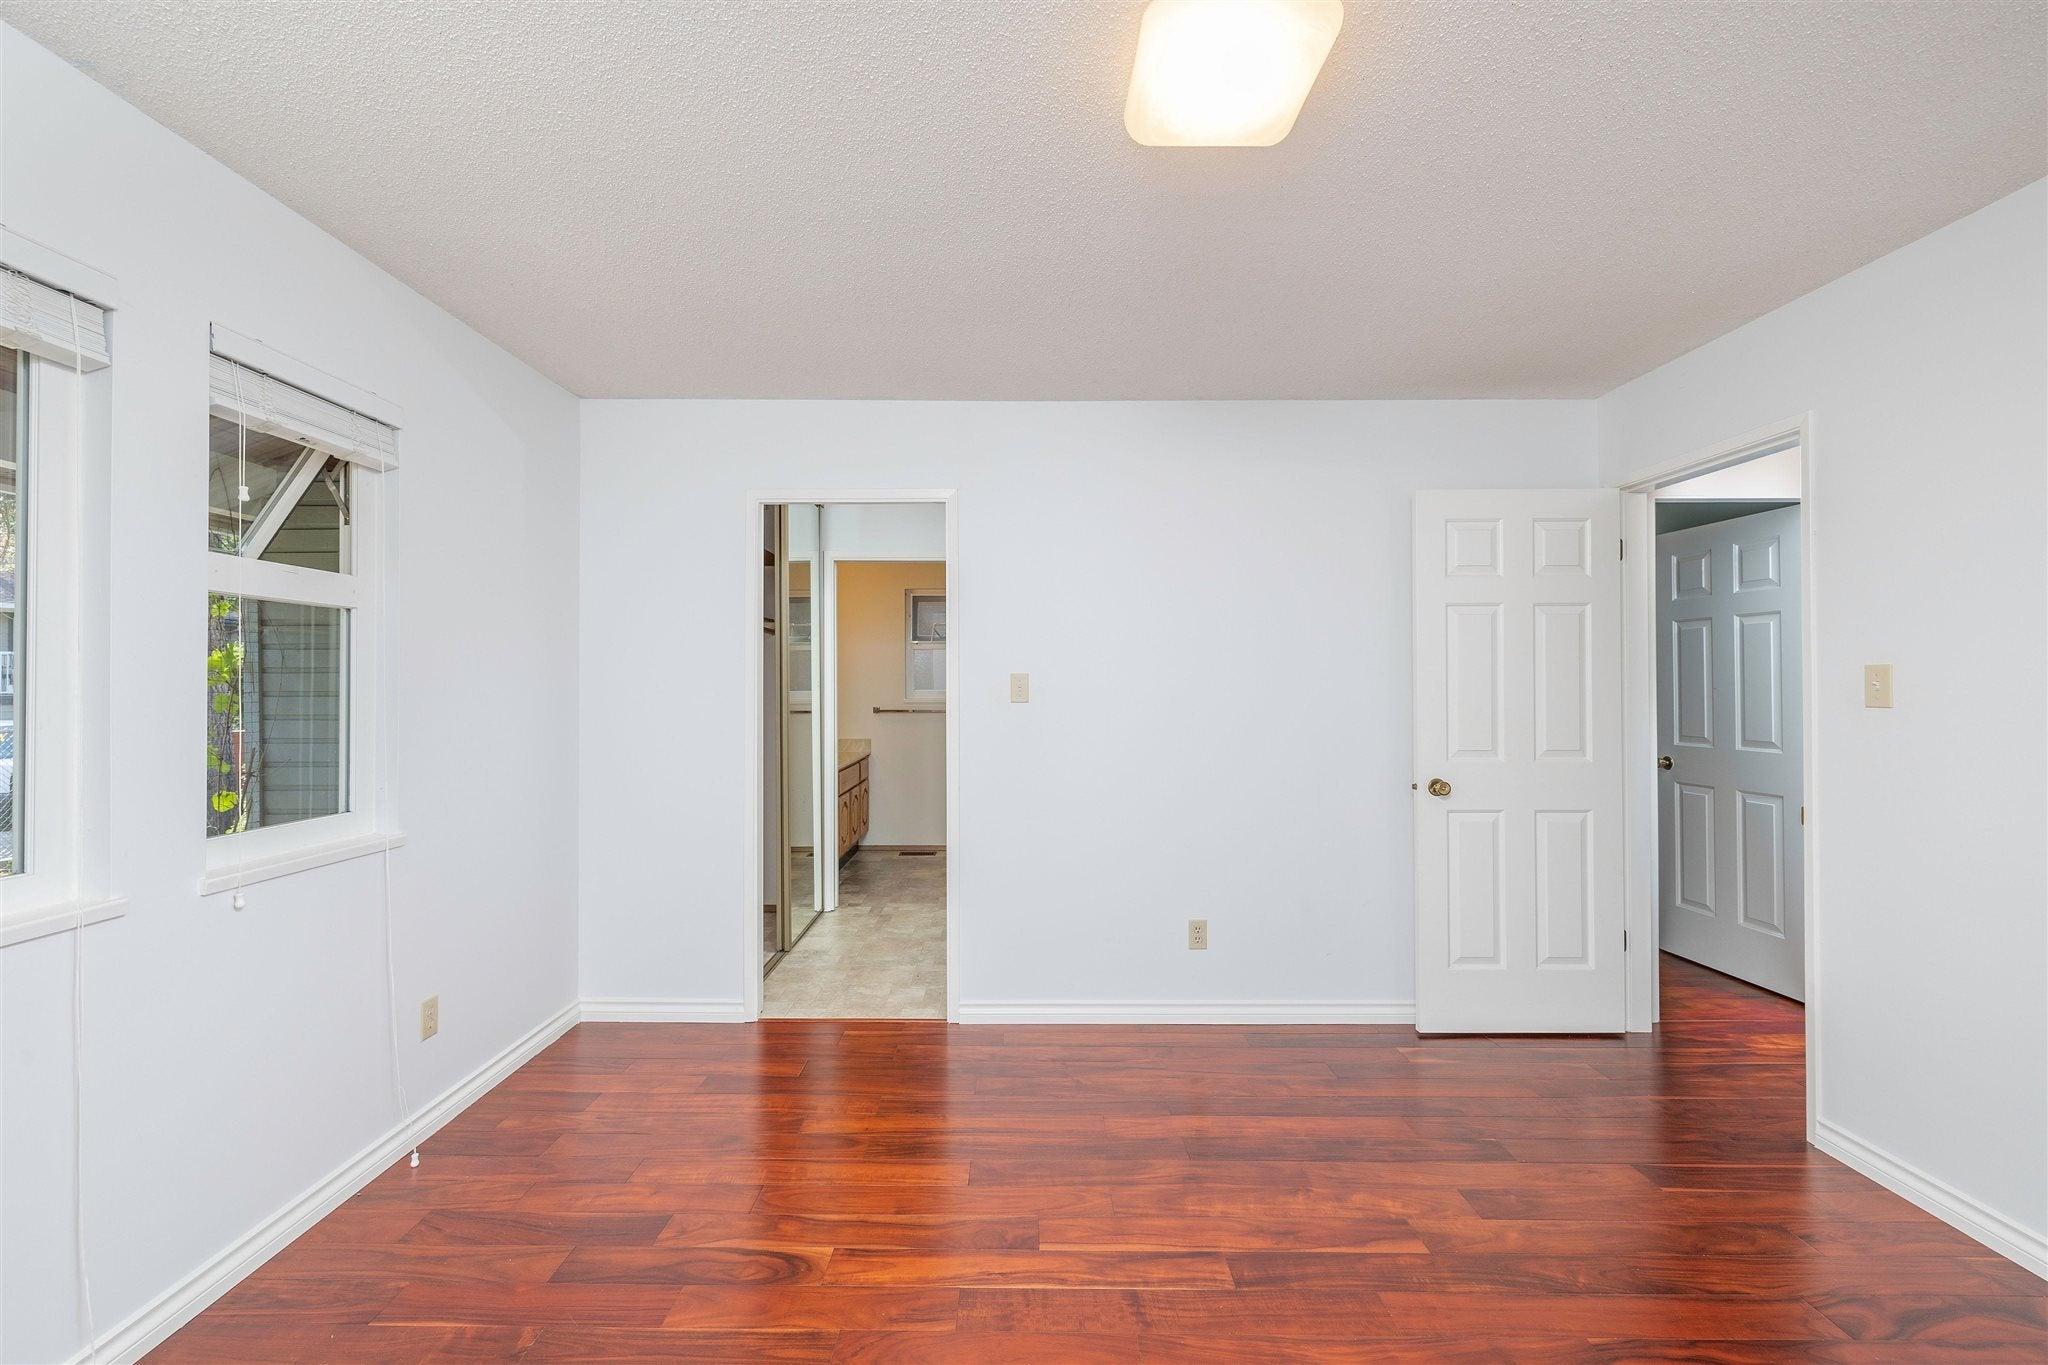 1743 148A STREET - Sunnyside Park Surrey House/Single Family for sale, 3 Bedrooms (R2604804) - #14